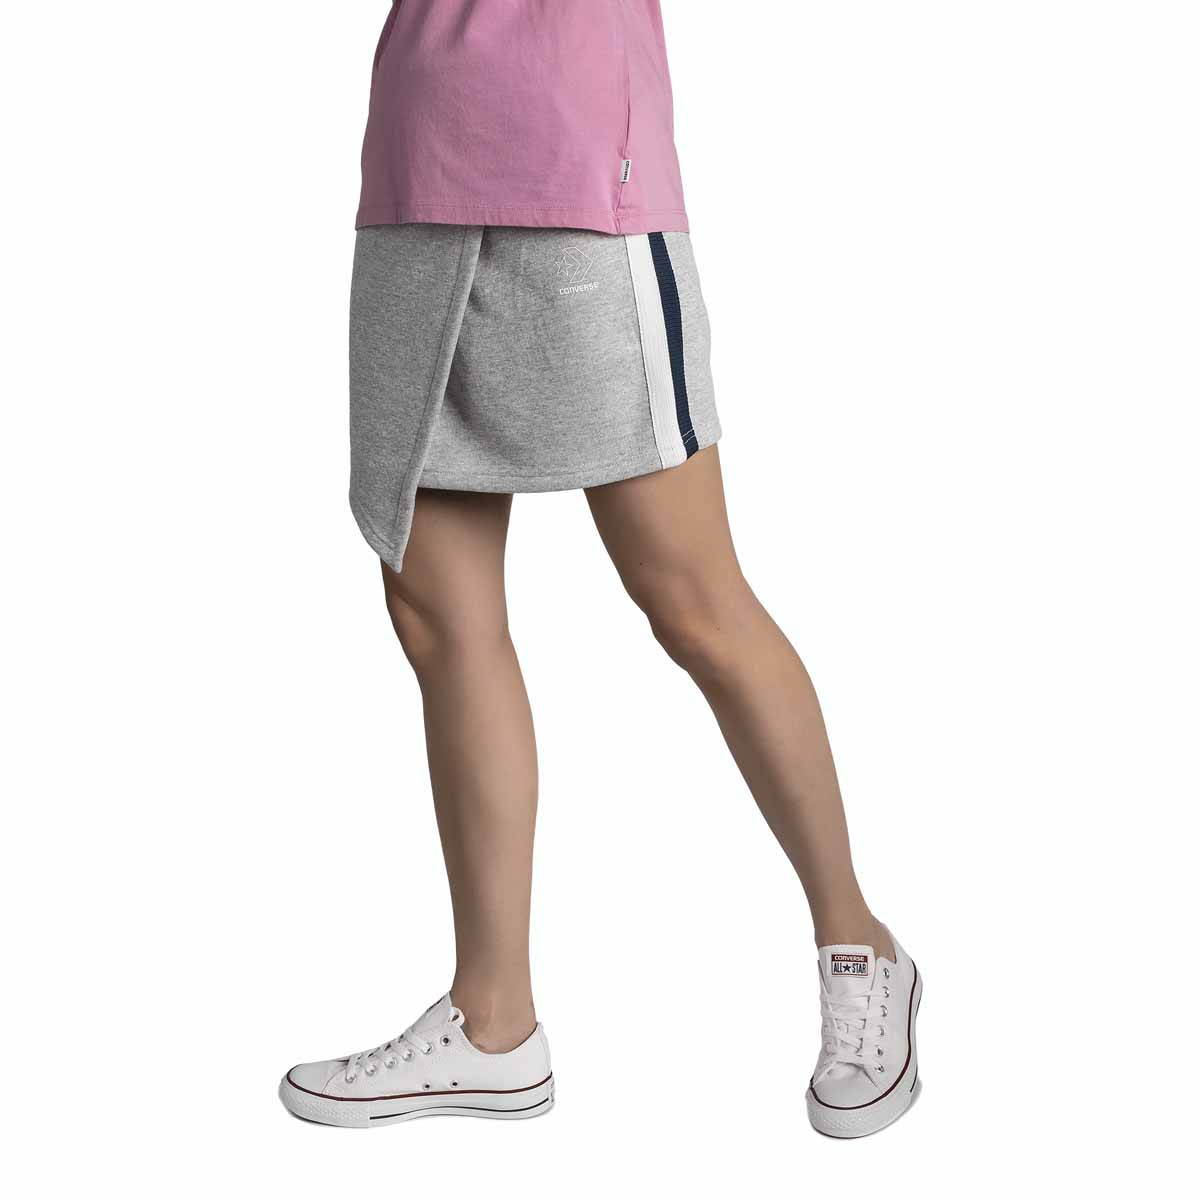 Юбка Converse Star Chevon Track Skirt, цвет: серый. 10005759035. Размер XS (42) свитшот женский converse star chervon track cropped crew цвет серый 10005758035 размер xs 42